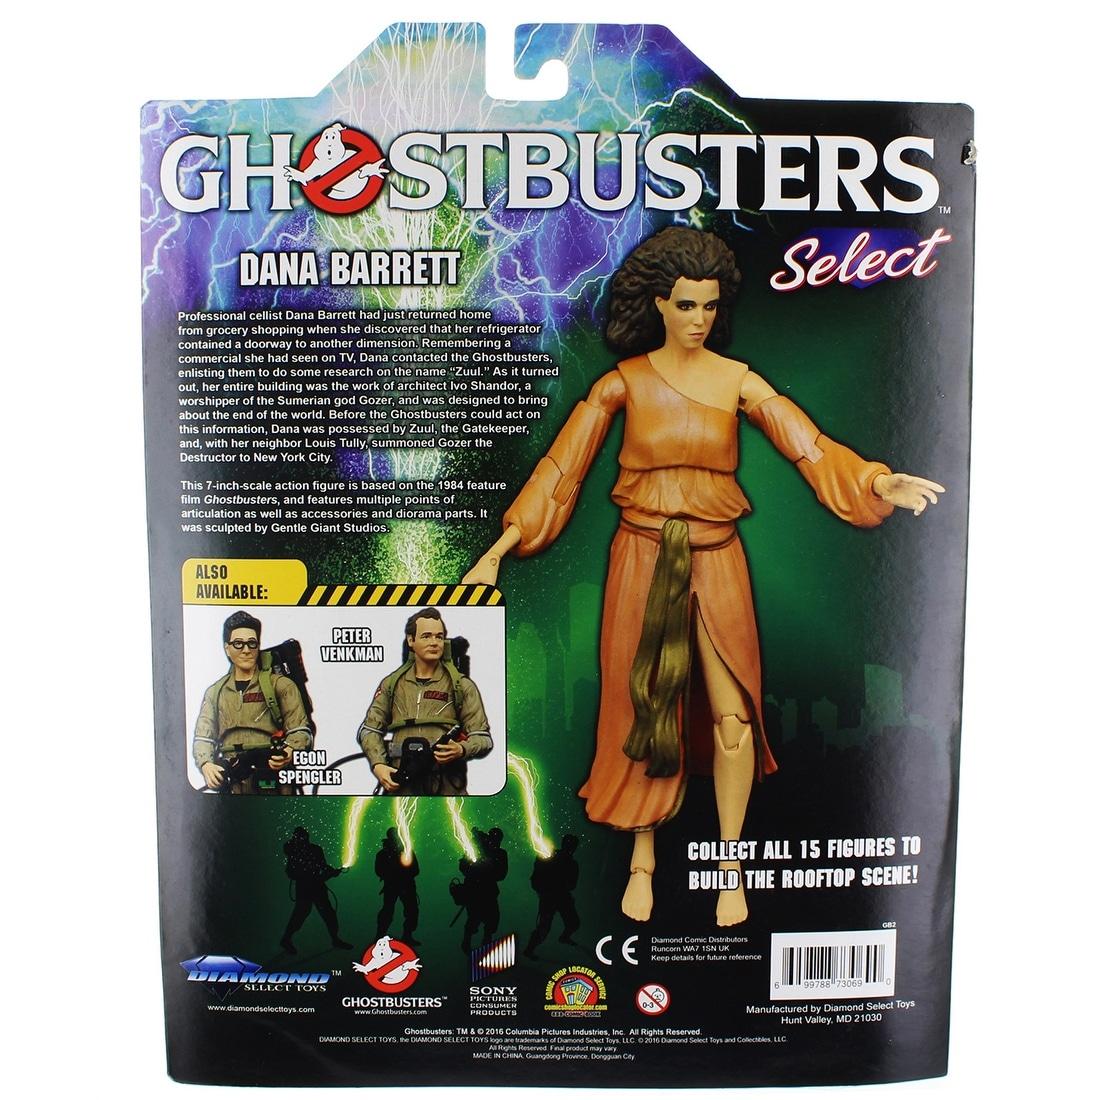 Dana Barrett-Ghostbusters 2 DIAMOND SELECT Figure